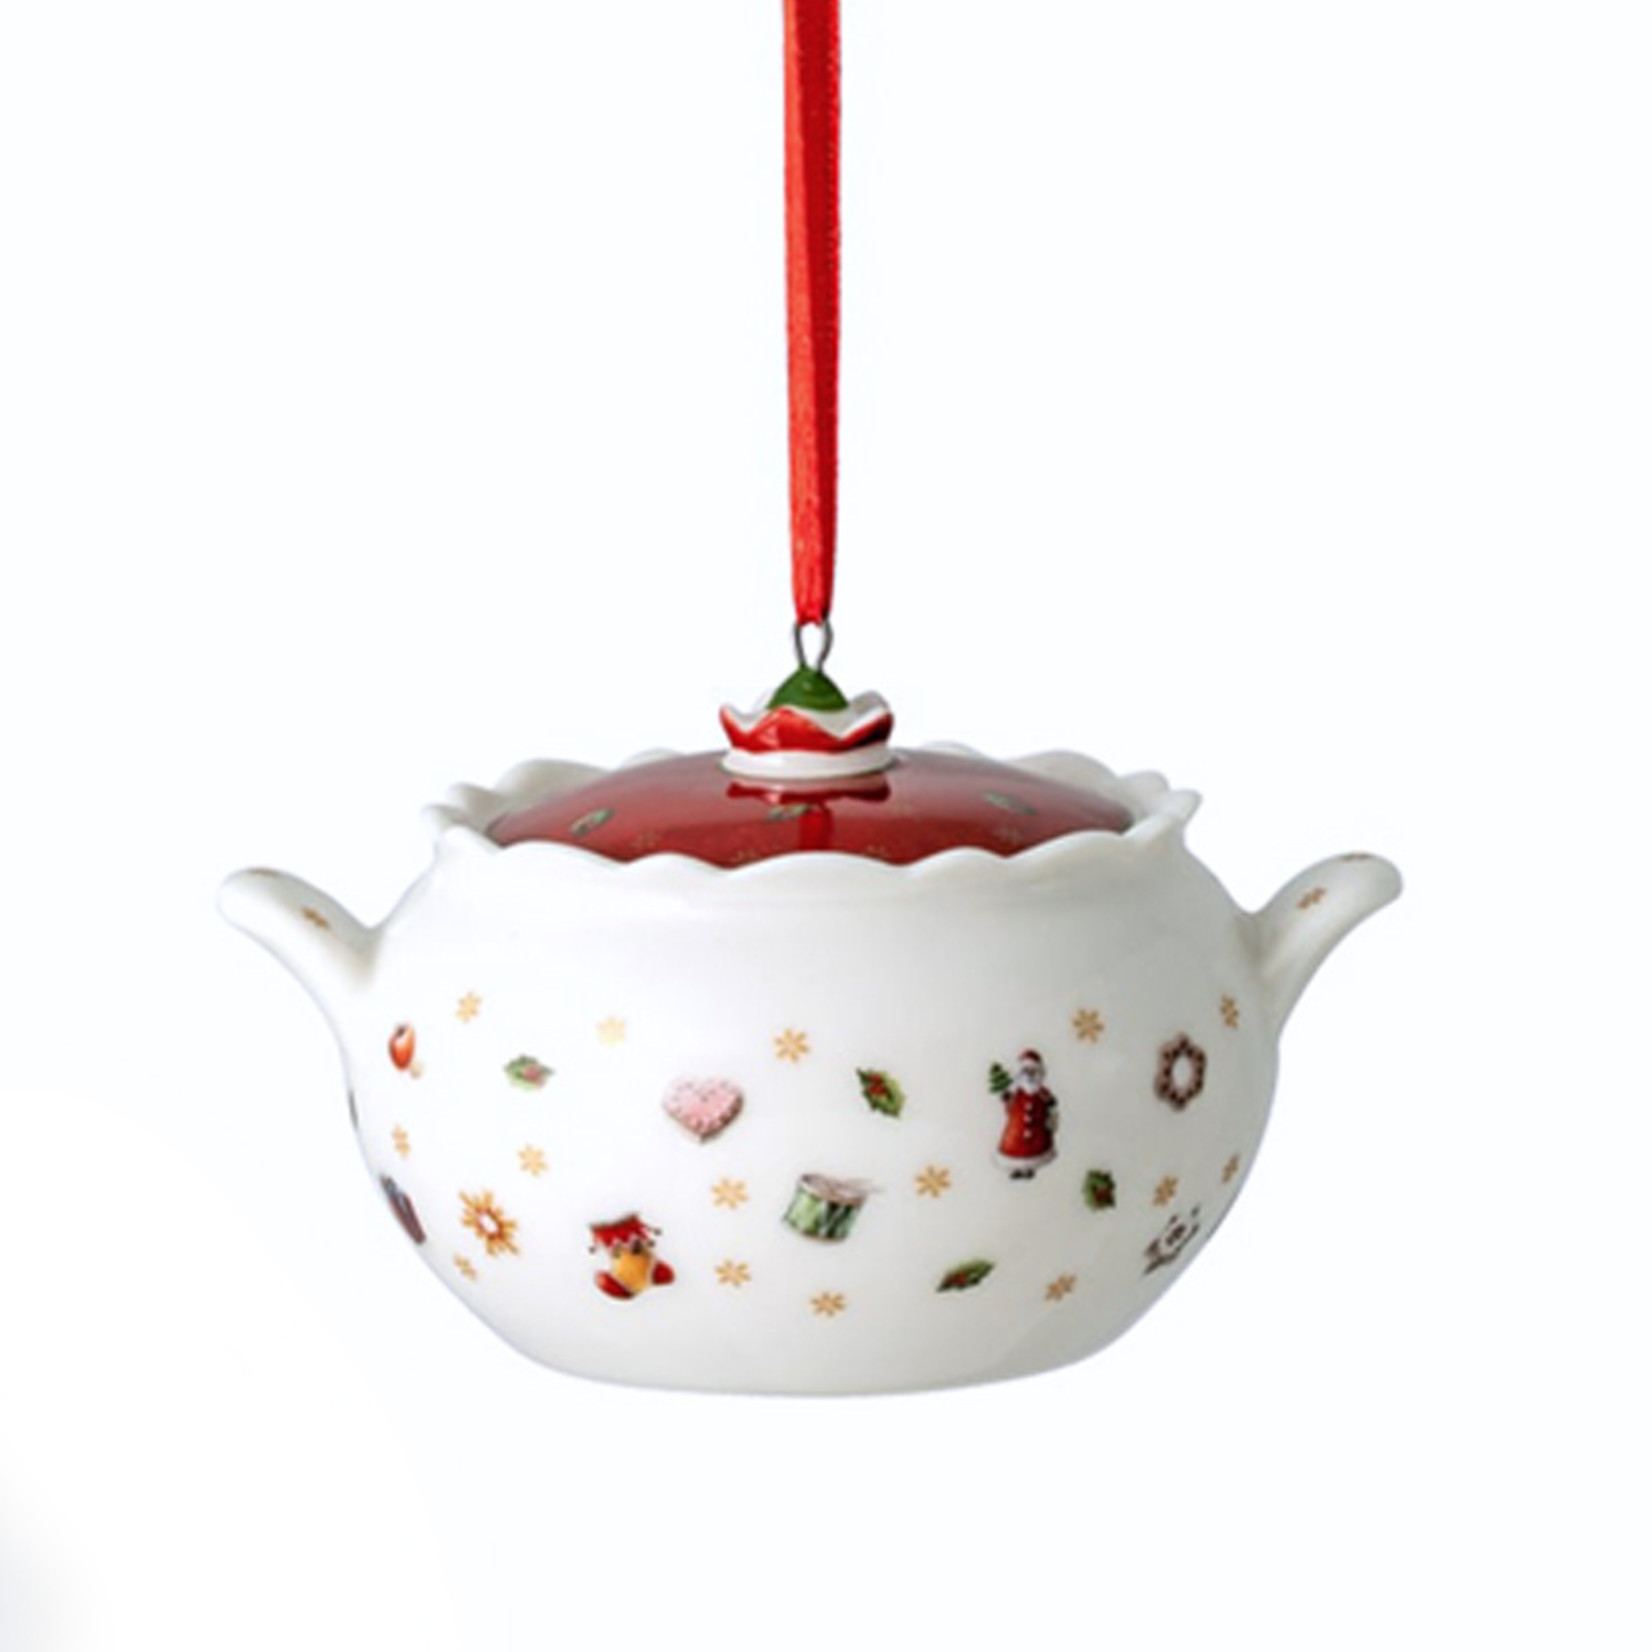 Villeroy & Boch  Hänger Set Servierteile | Villeroy & Boch Toy's Delight Decoration